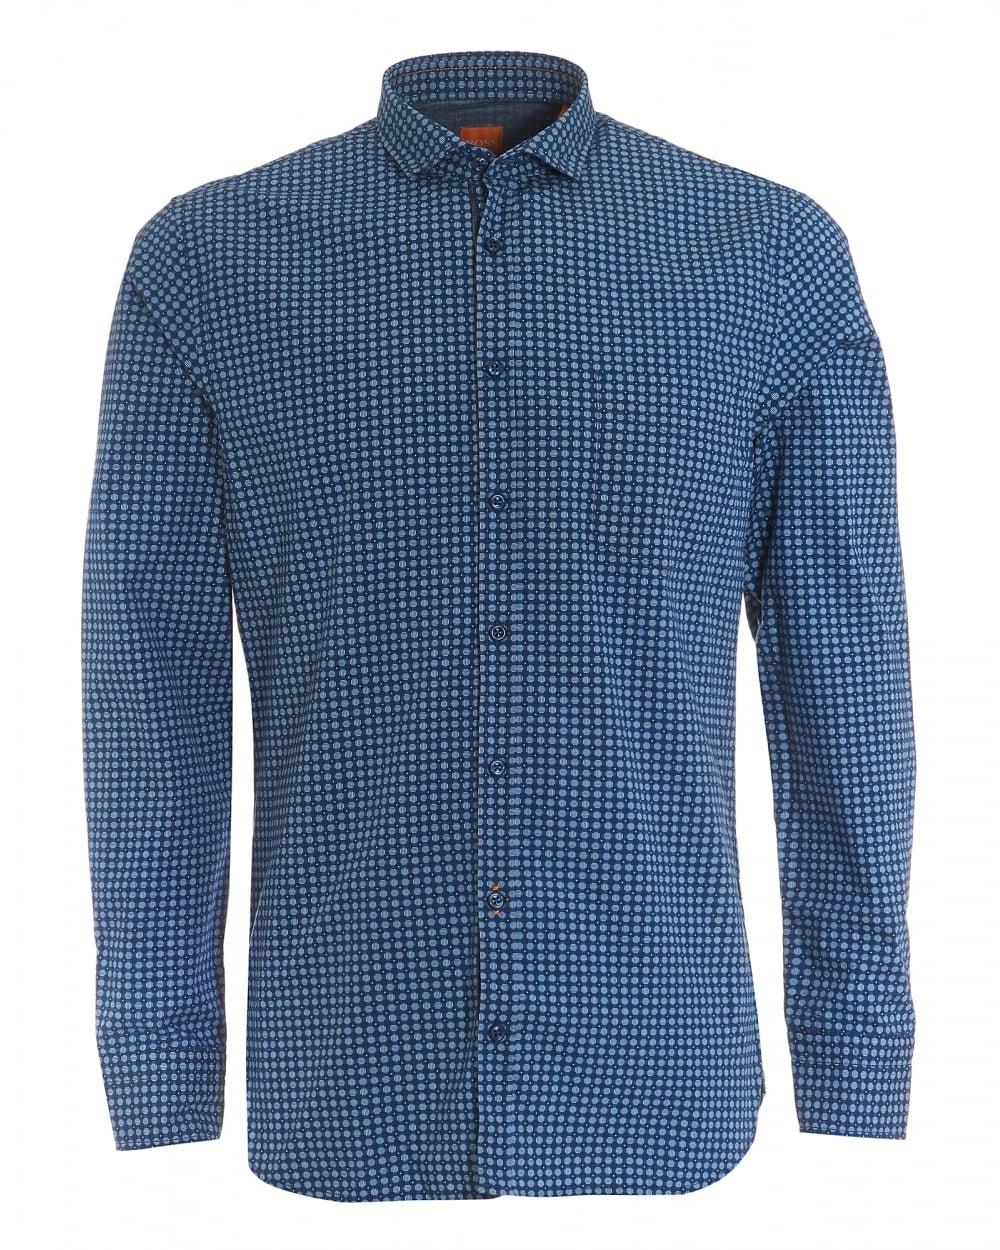 b0c47898a Hugo Boss Orange Mens Cattitude Slim Fit Geometric Print Navy Shirt